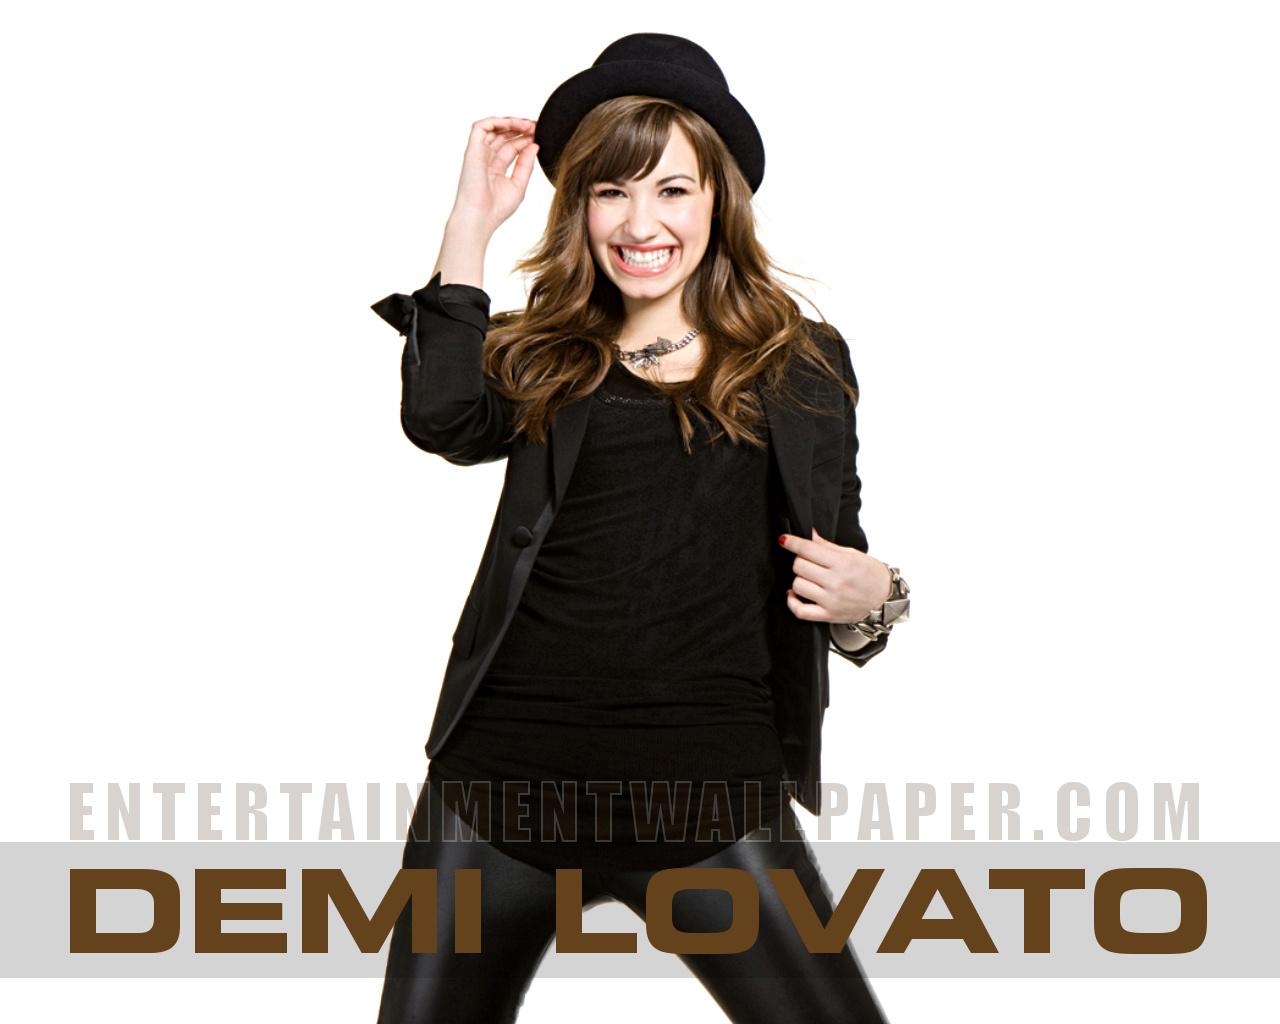 Demi Lovato Wallpaper Desktop For Desktop 1280x1024